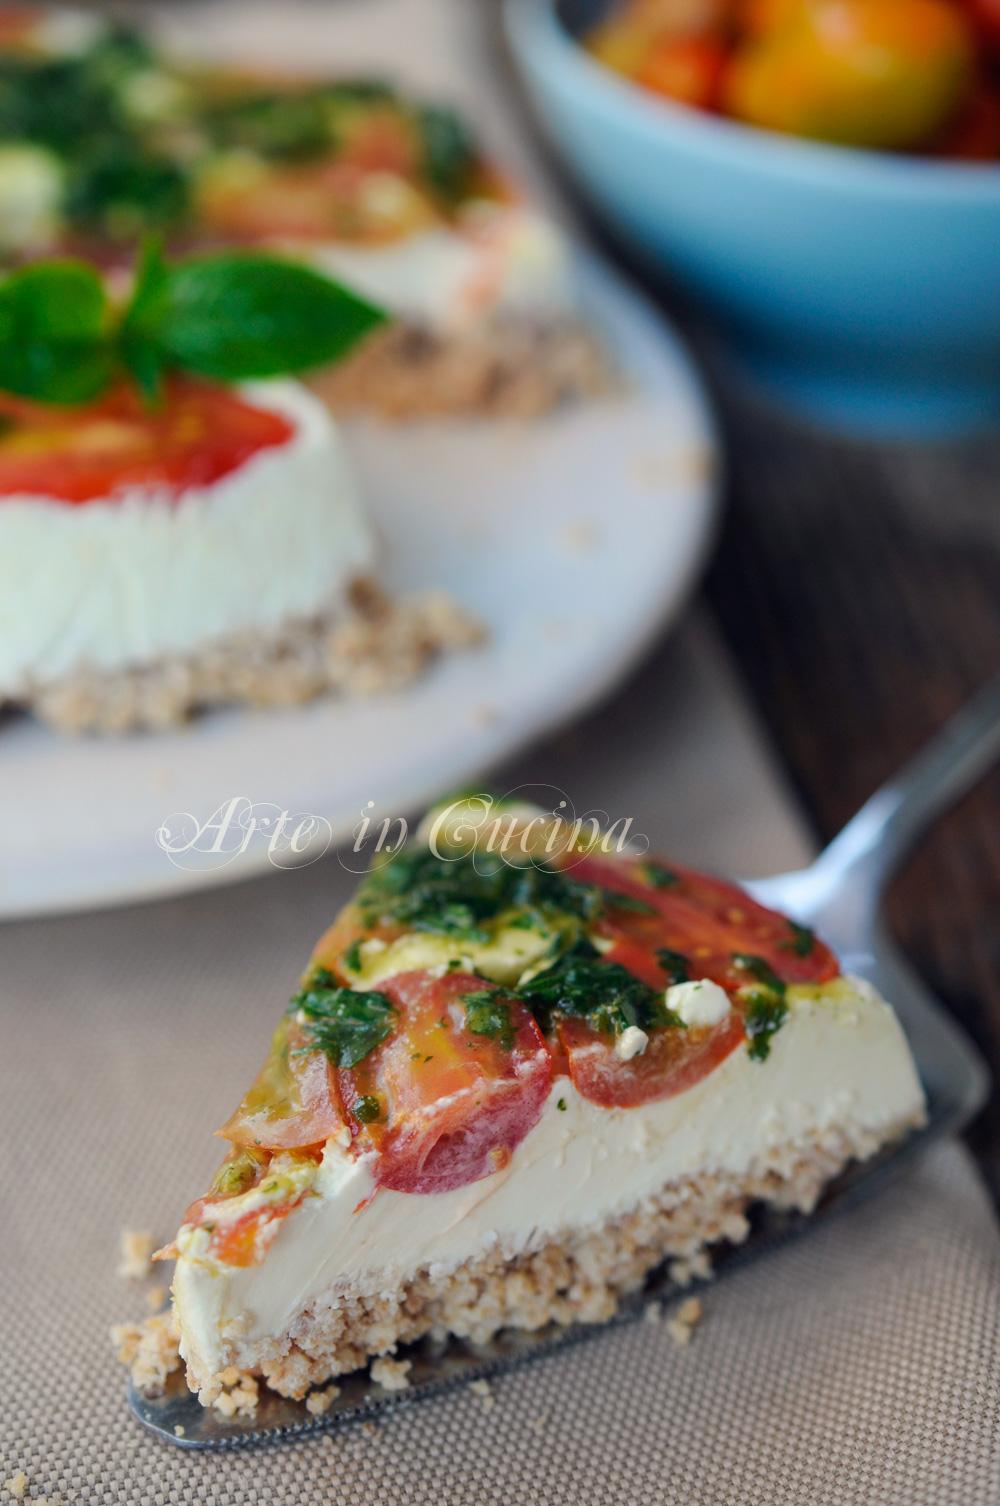 Cheesecake salata senza cottura ricetta veloce vickyart arte in cucina